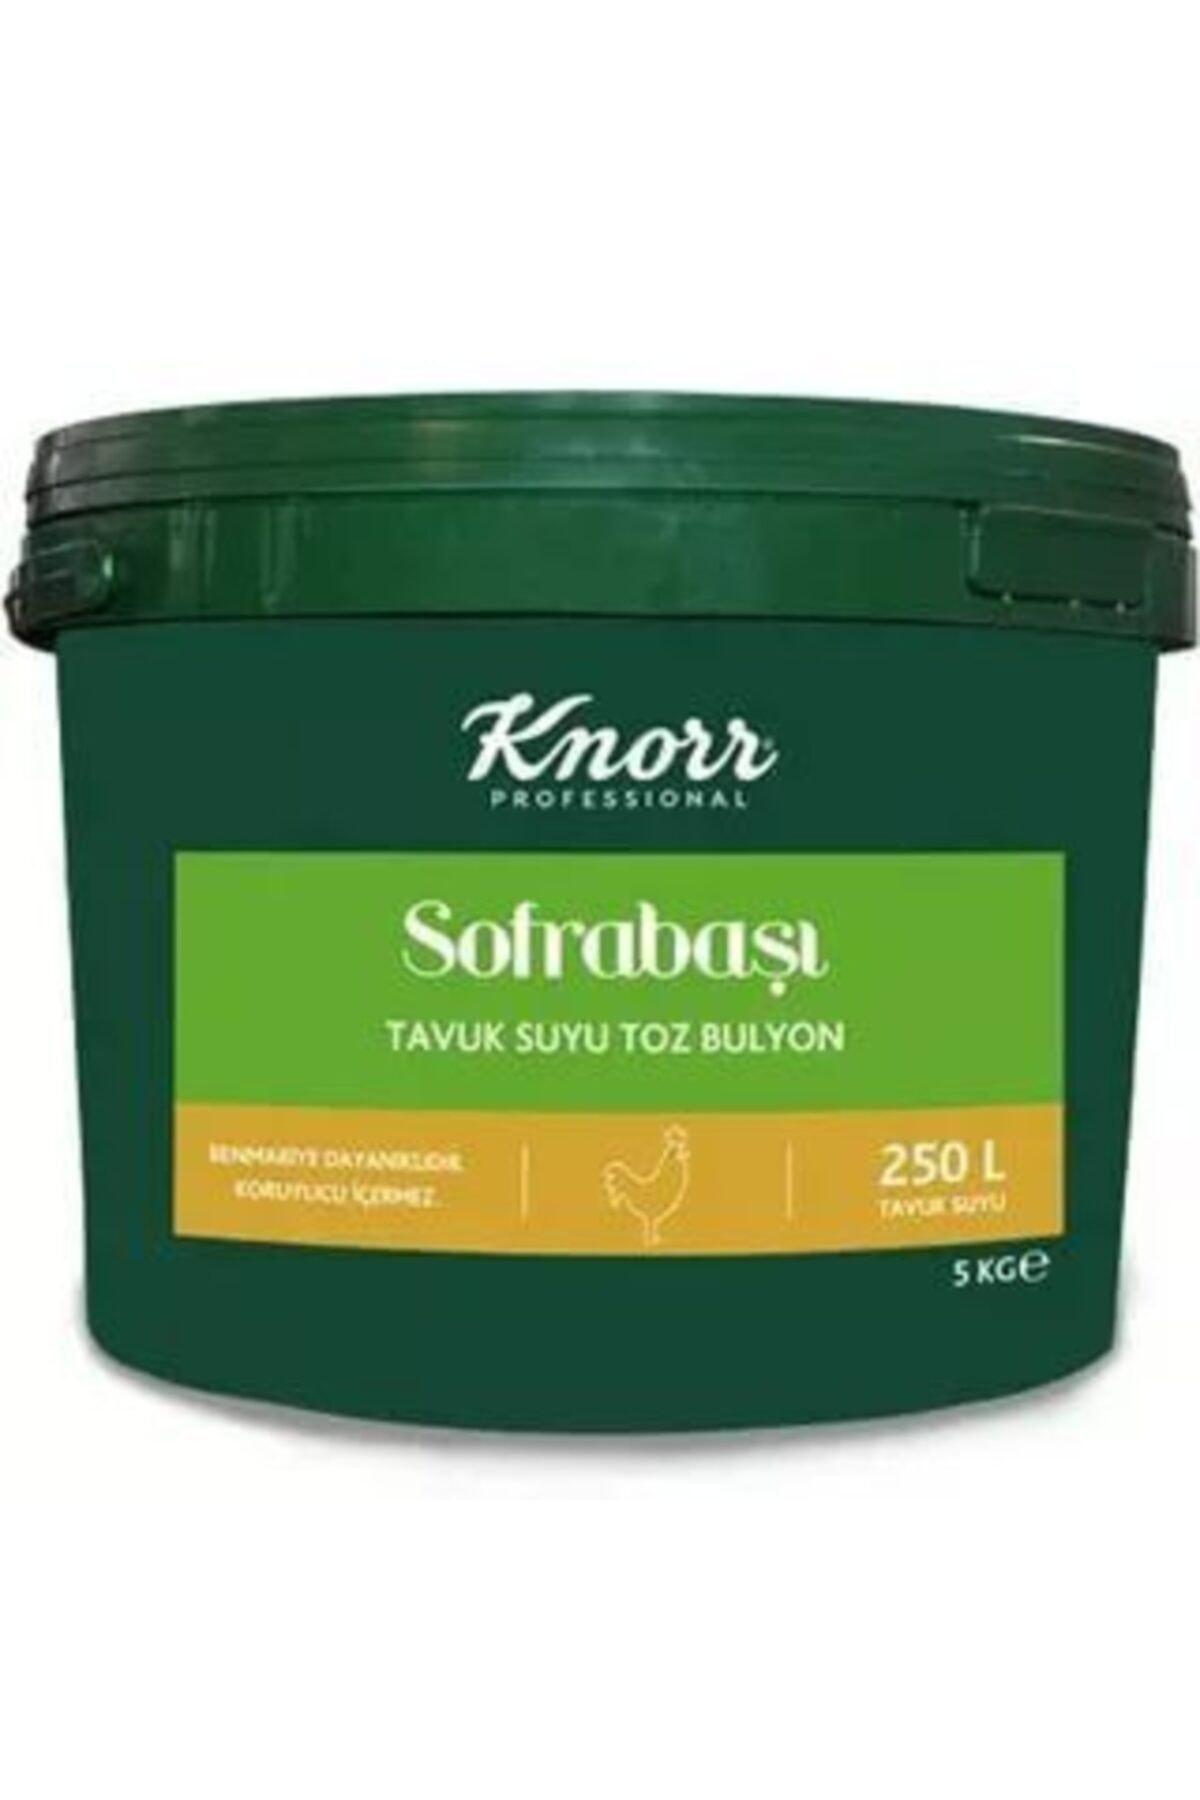 Knorr Sofrabaşı Tavuk Suyu Toz Bulyon 5 kg 1